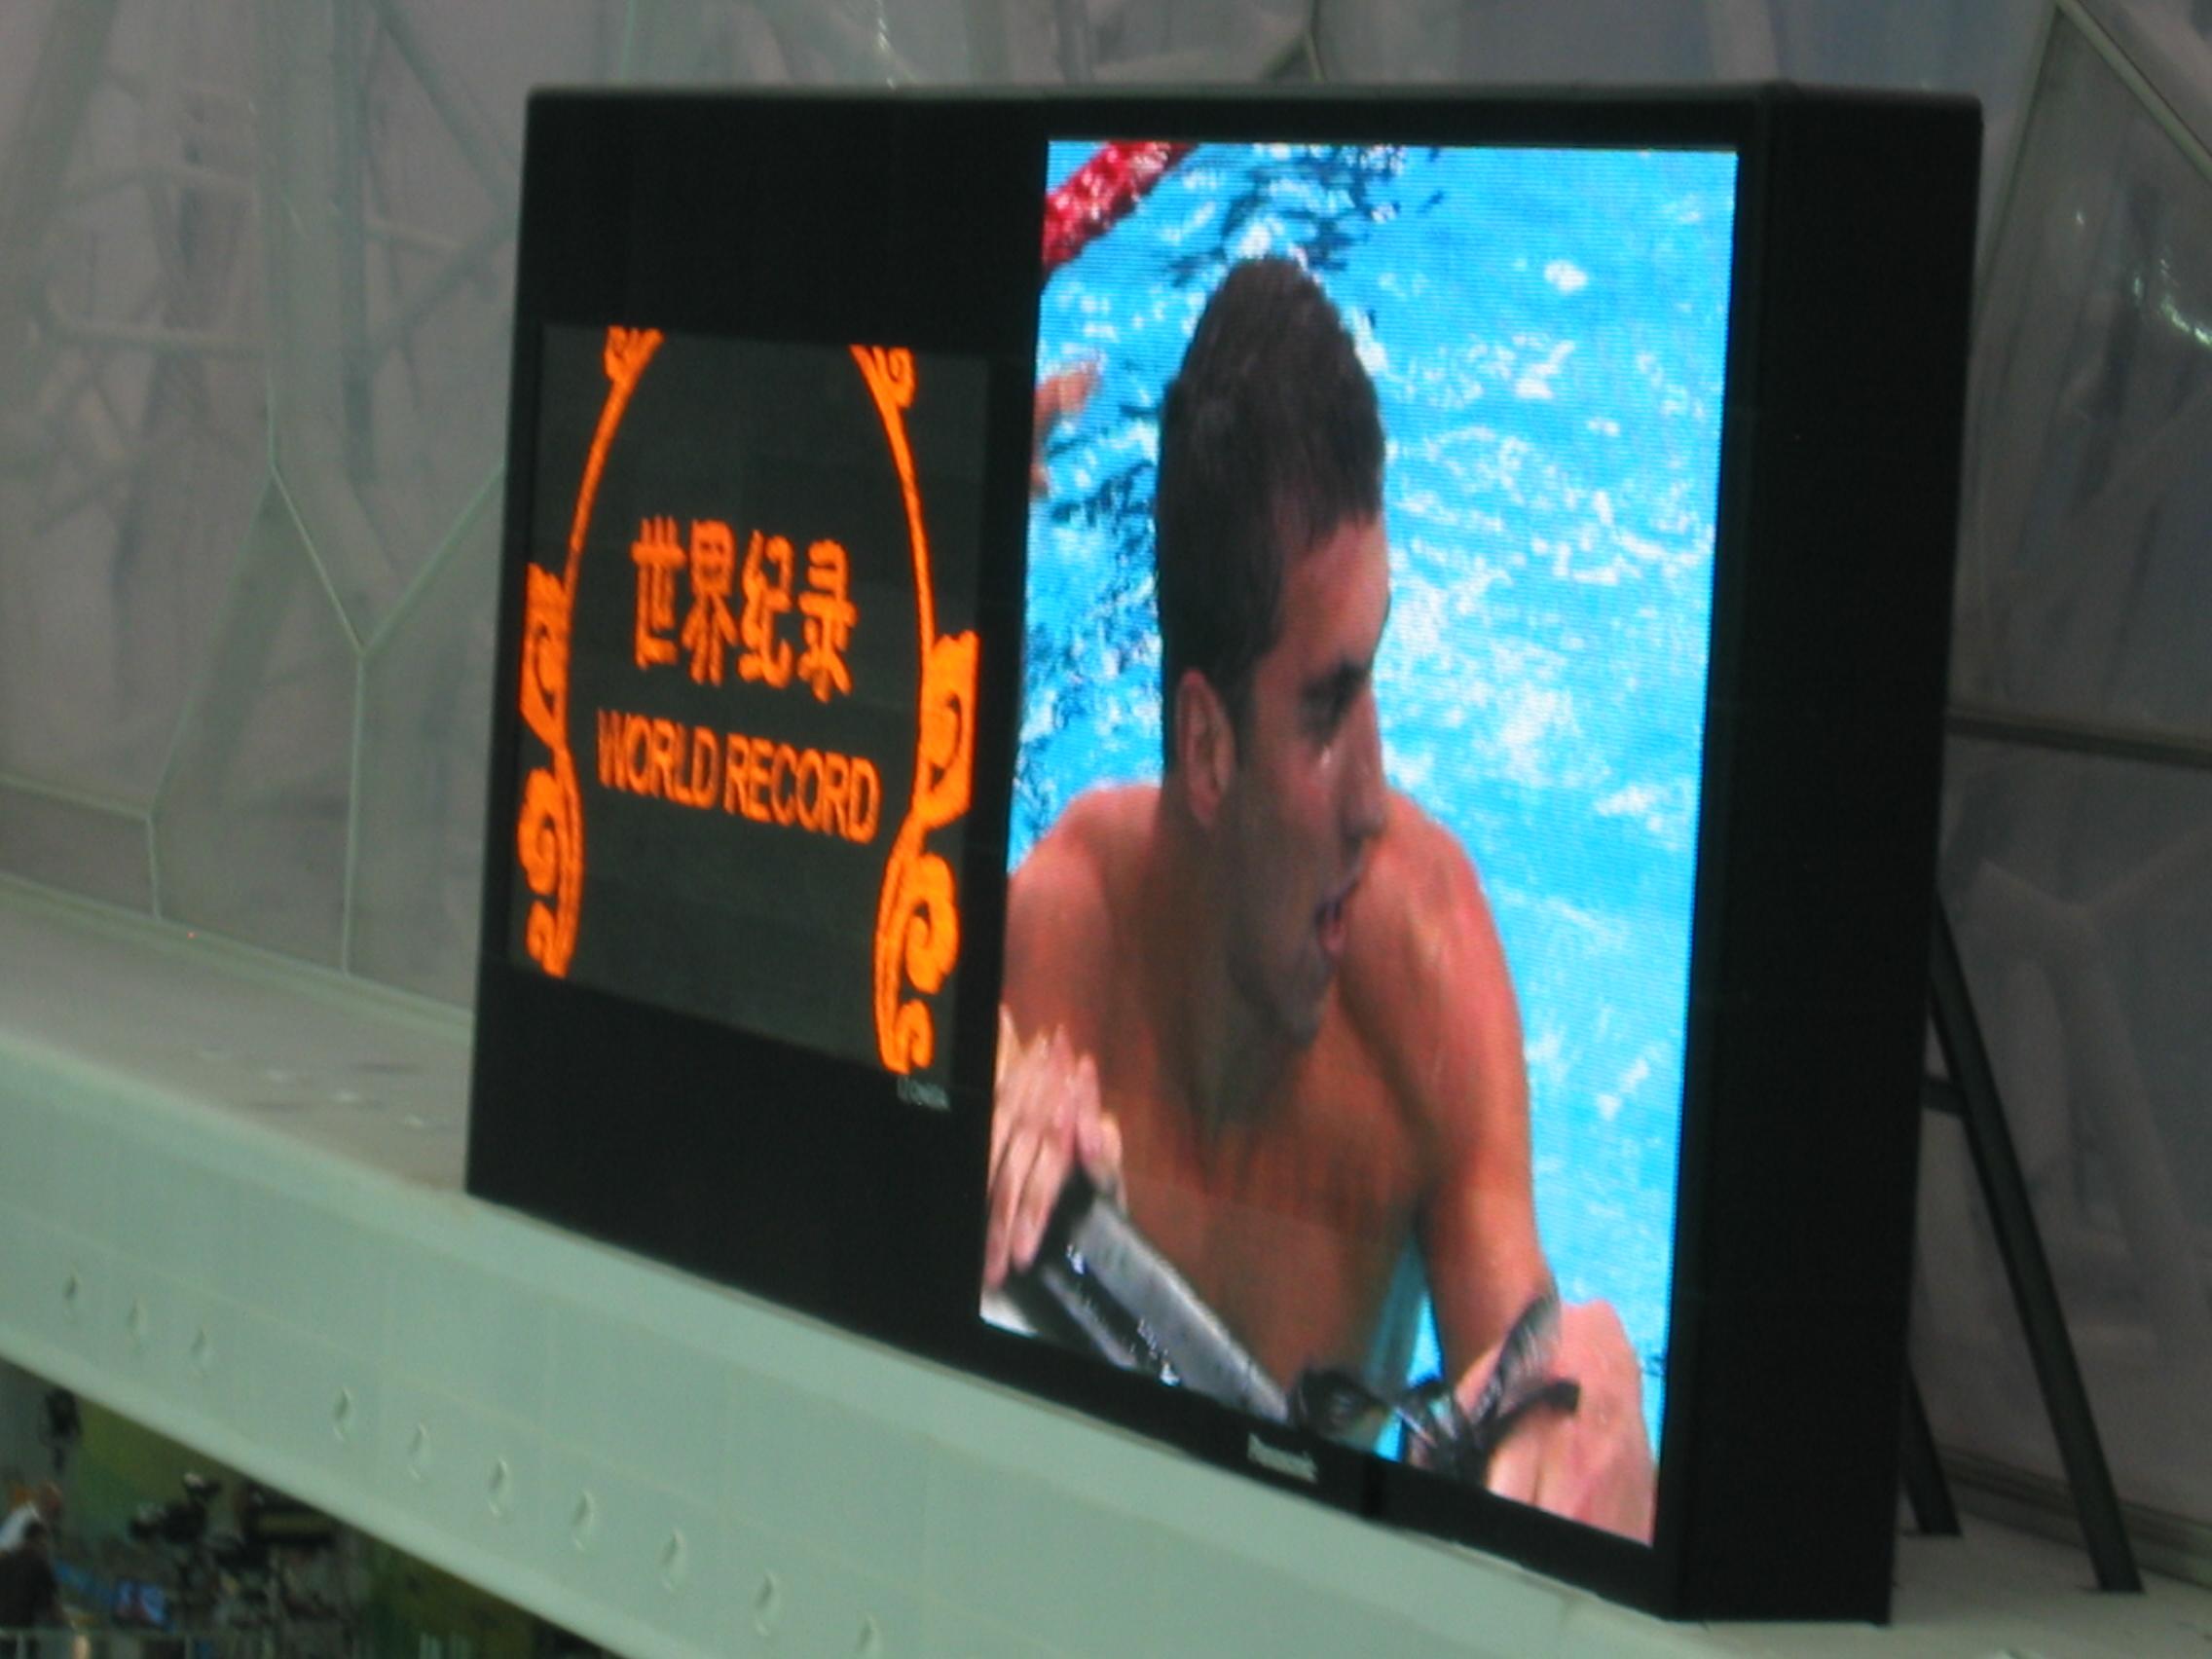 Gold medal no. 6 in Beijing